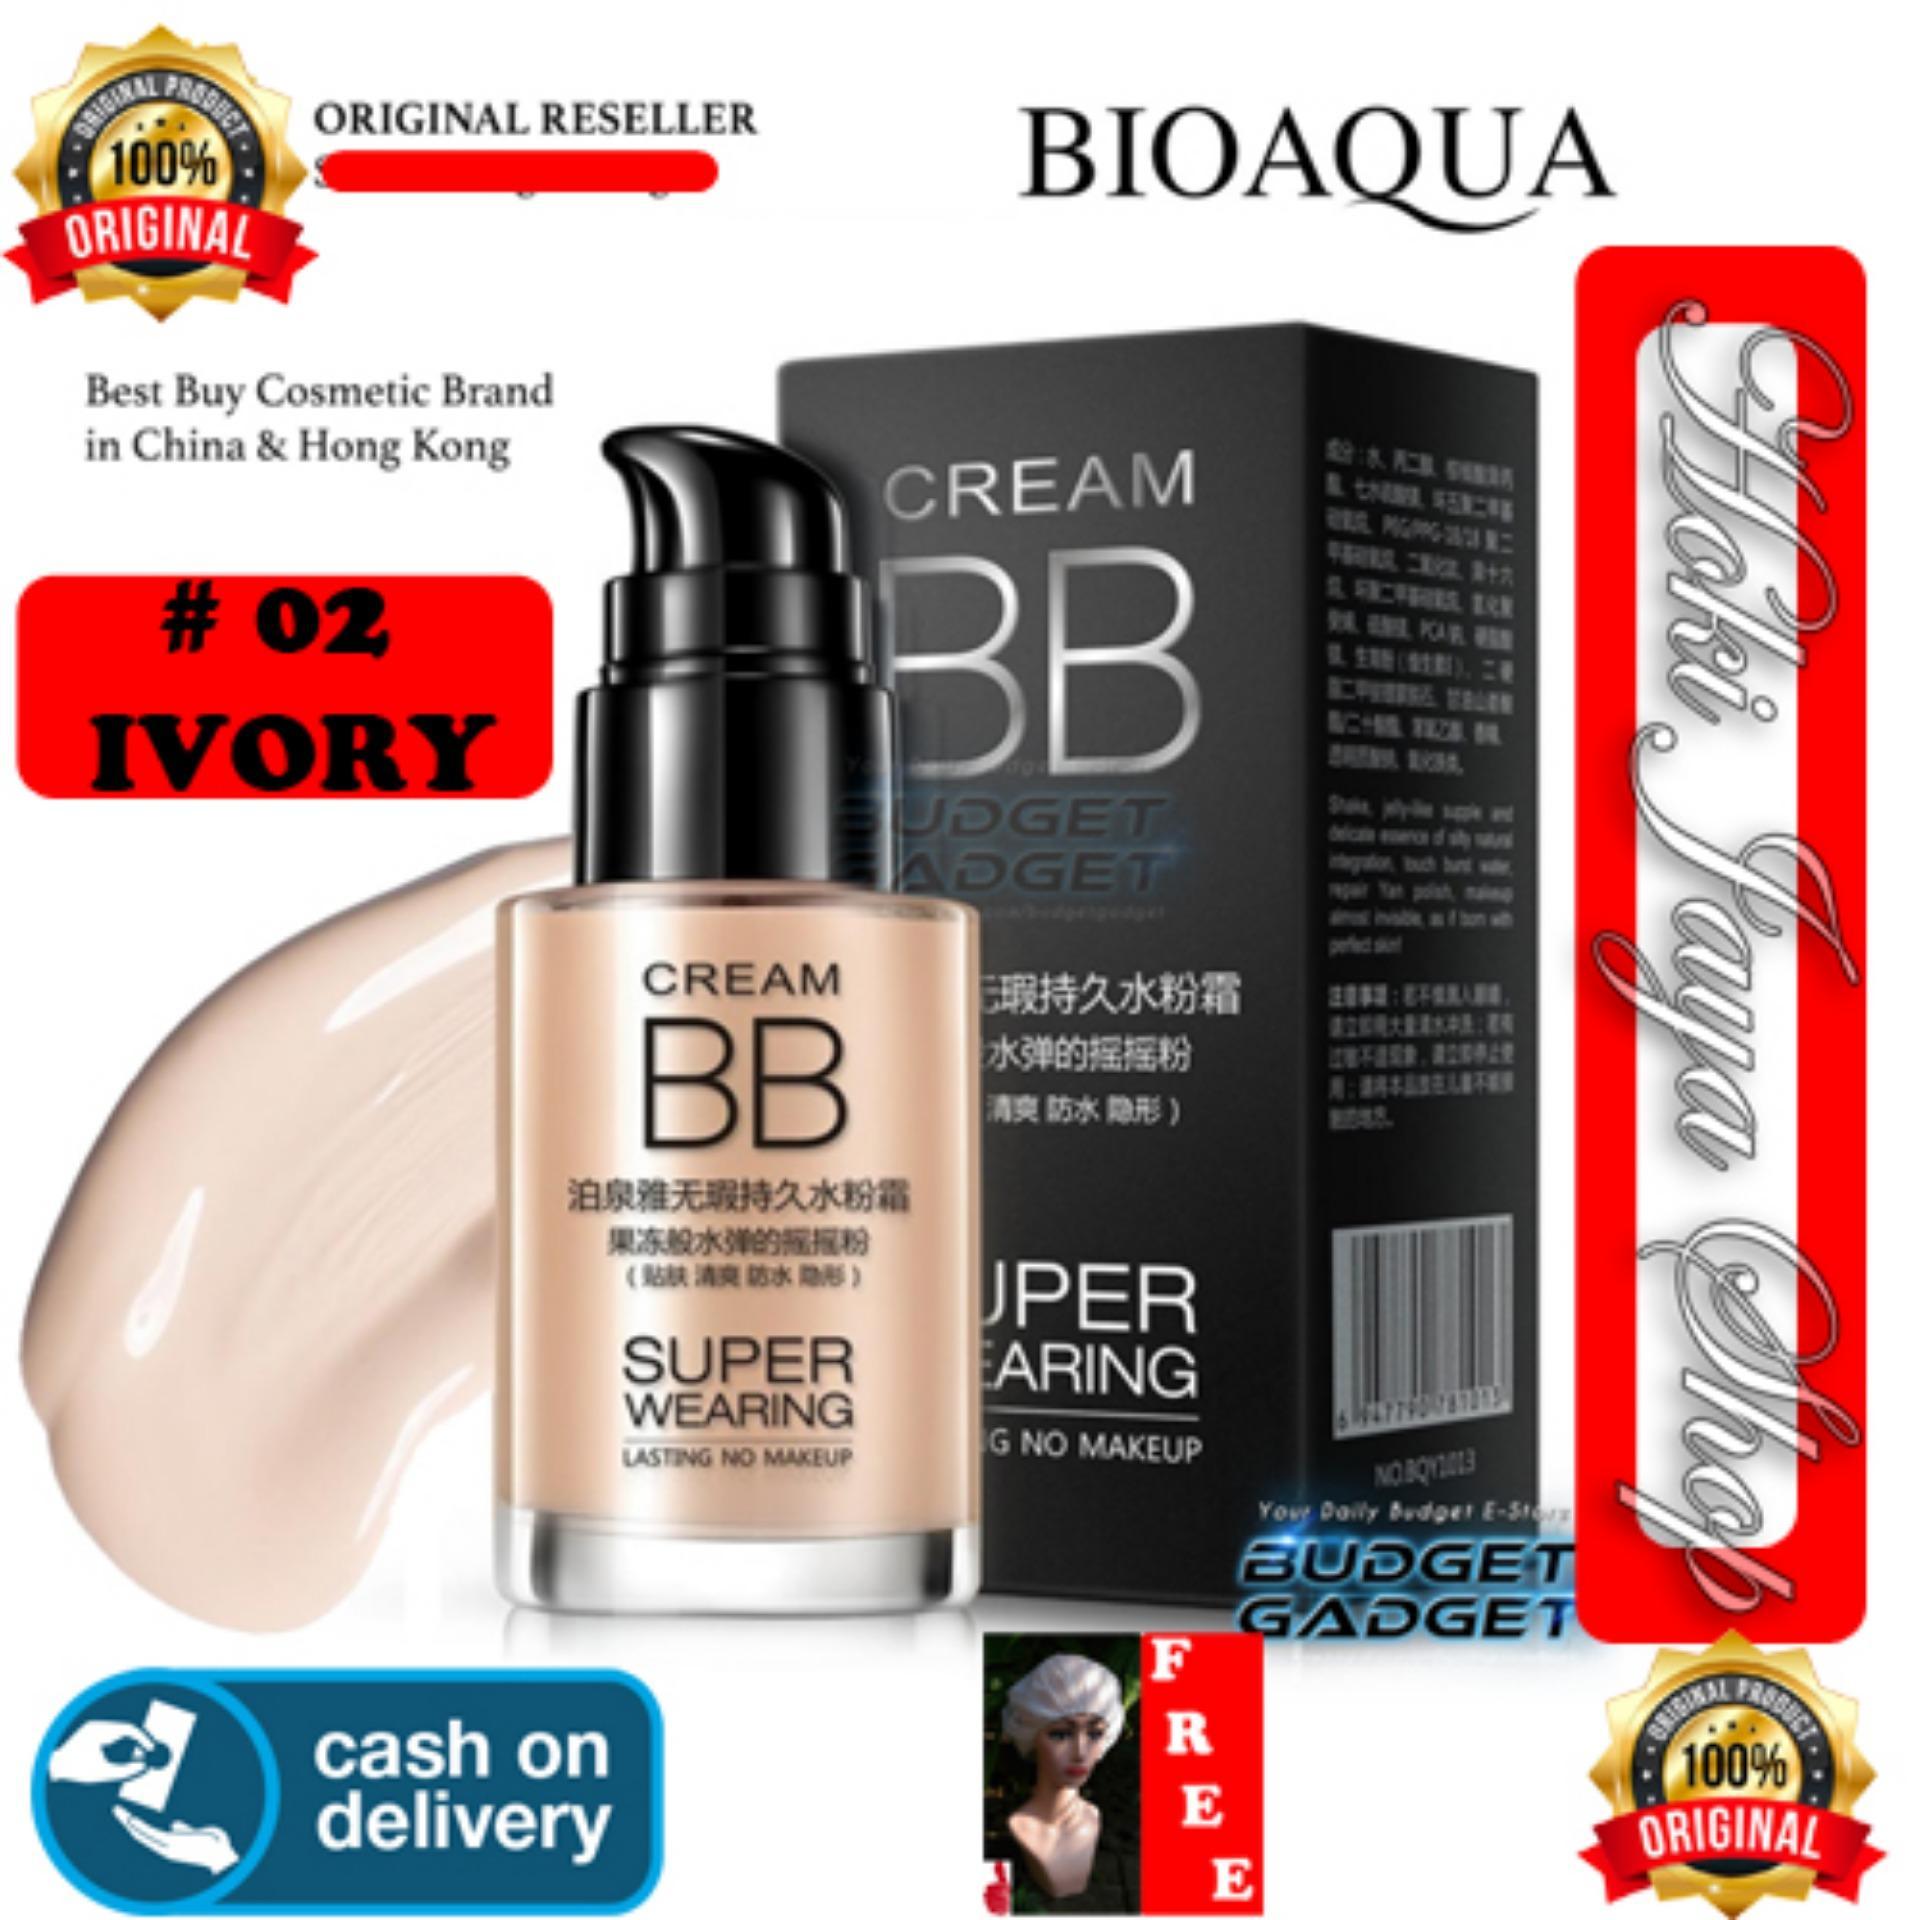 Bioaqua Bb Cream Super Wearing Lasting Concealer Foundation Make Up Ivory White 02 Cushion Exquisite Delicate Plus Refill Hoki Cod